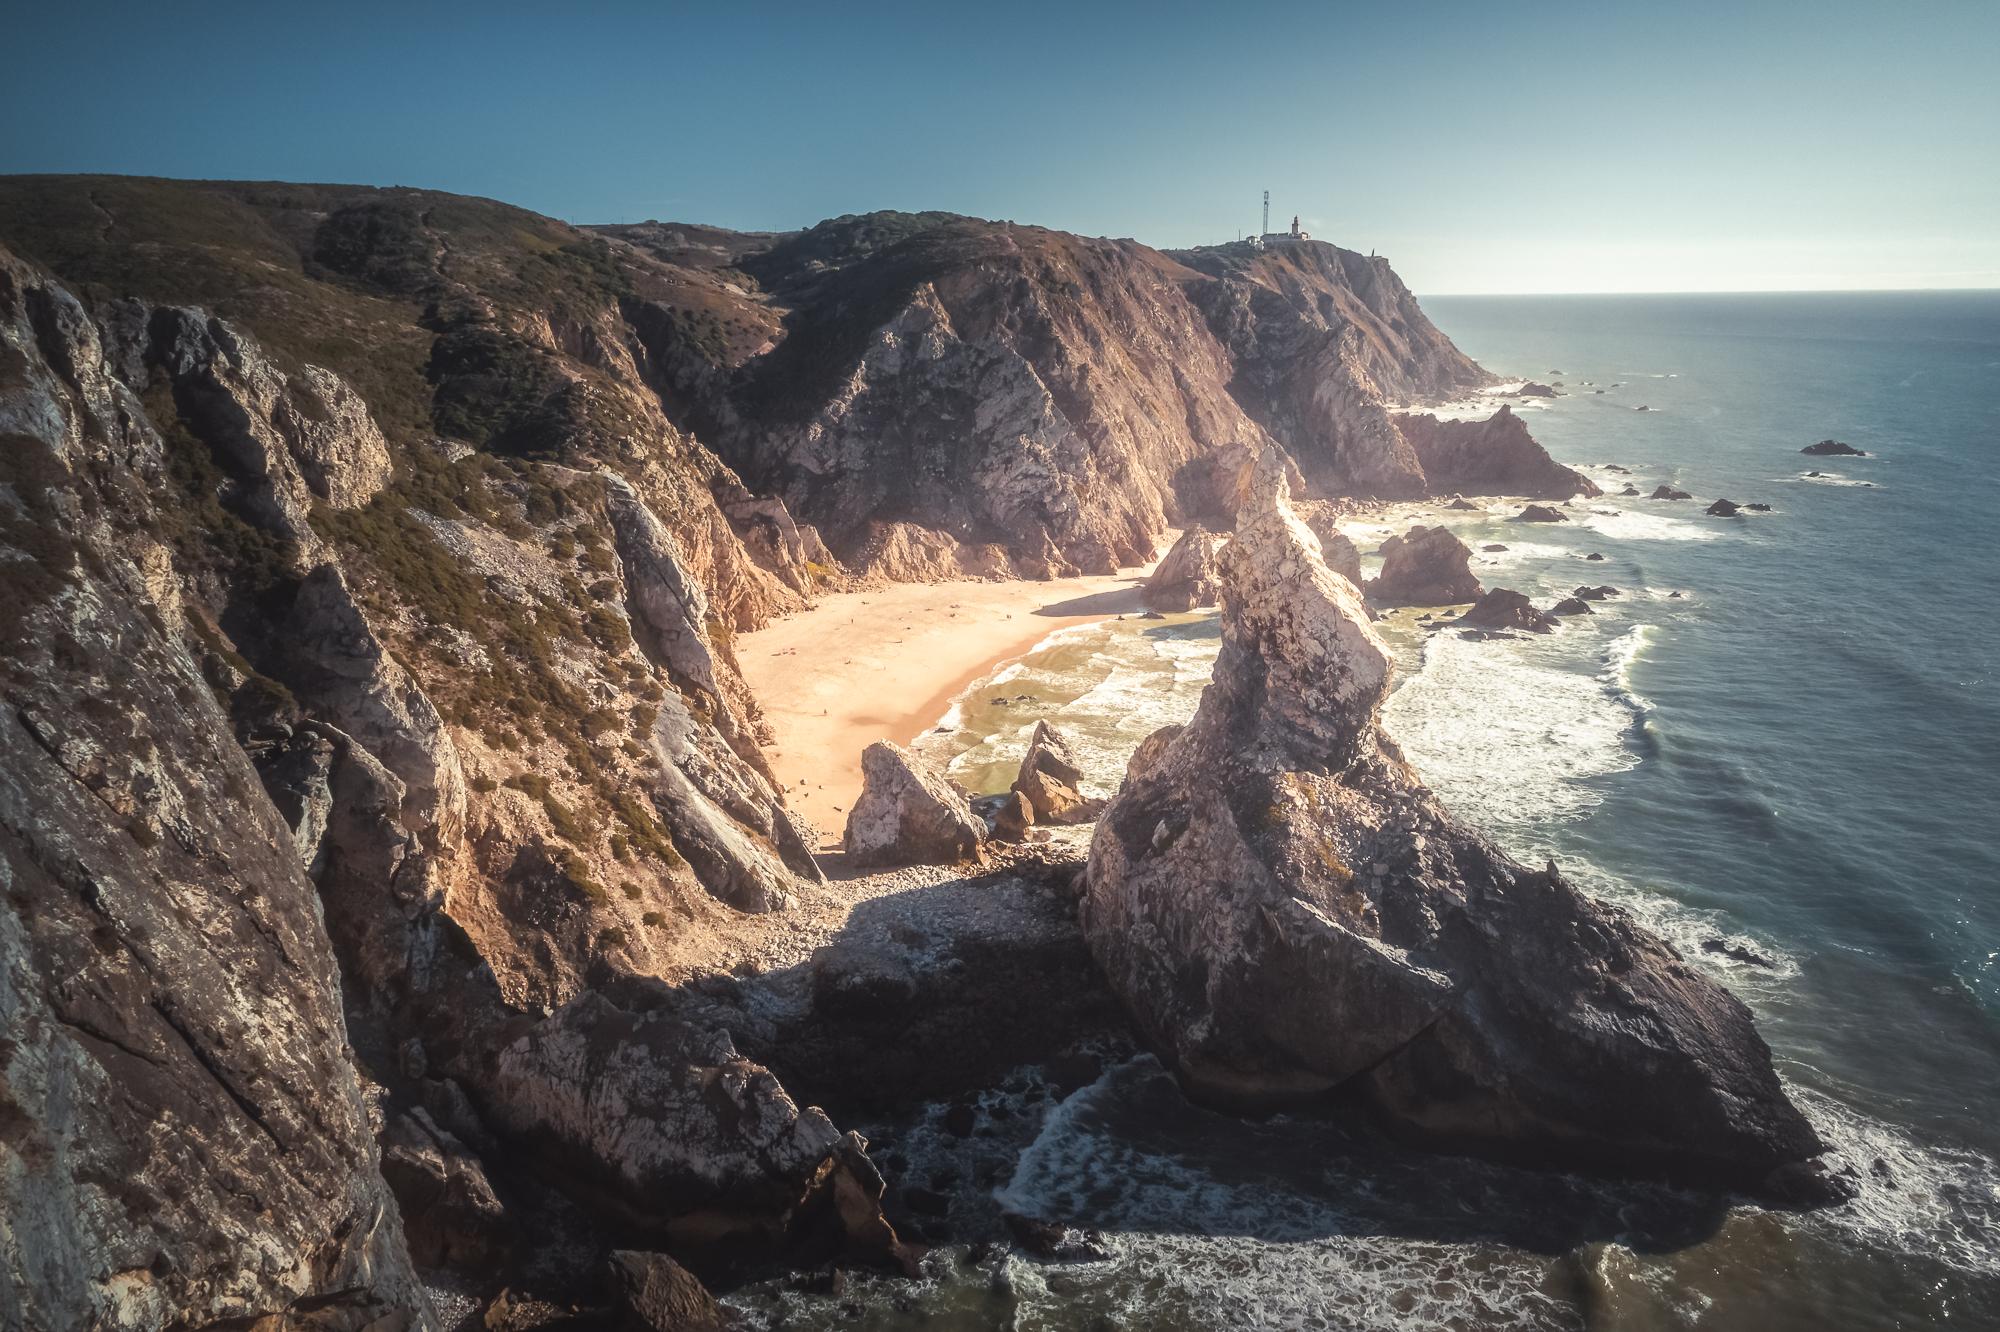 Portugal, Praia da Ursa, beach, Strand, Felsen, Klippen, Rocks, Cliffs, Landscape, Landschaft, Natur, Nature, Sunset, Sonnenuntergang, Travel, Reise, Blue Hour, Blaue Stunde, DJI, Phantom 4 Pro